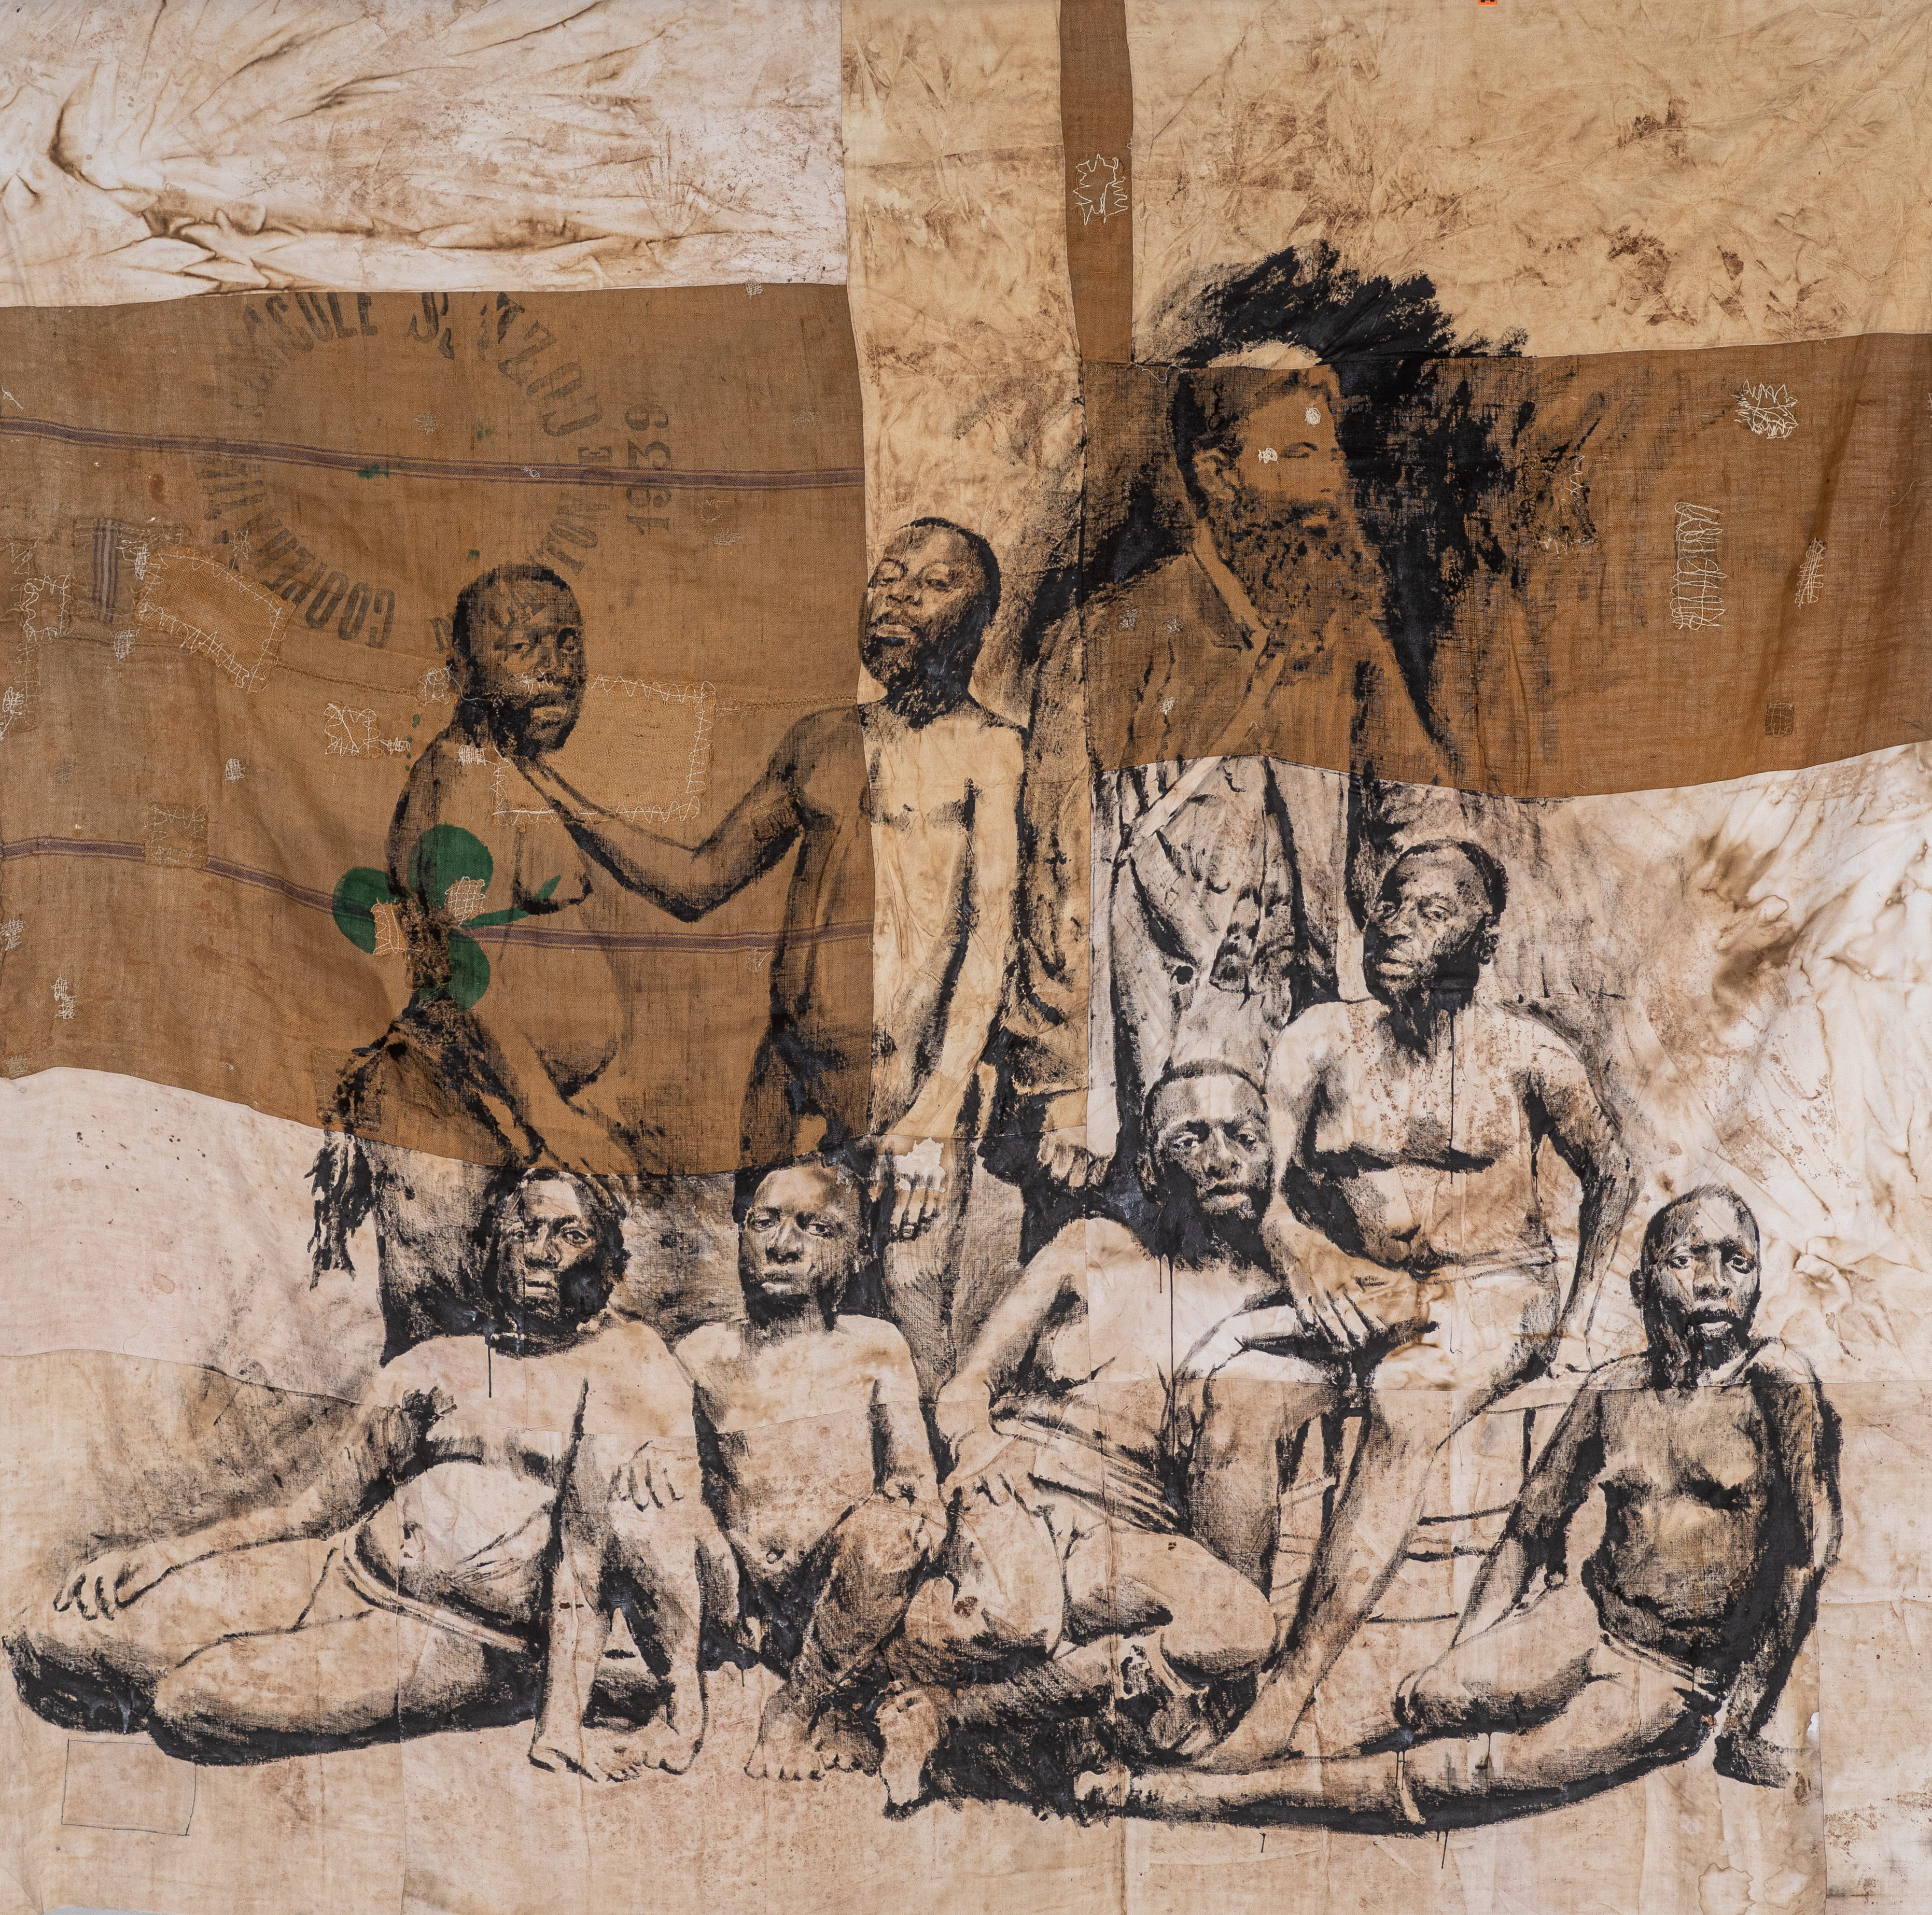 Galerie_Fakhoury - 13-09-2020 - HD - JPG (sRVB) (23 of 31)